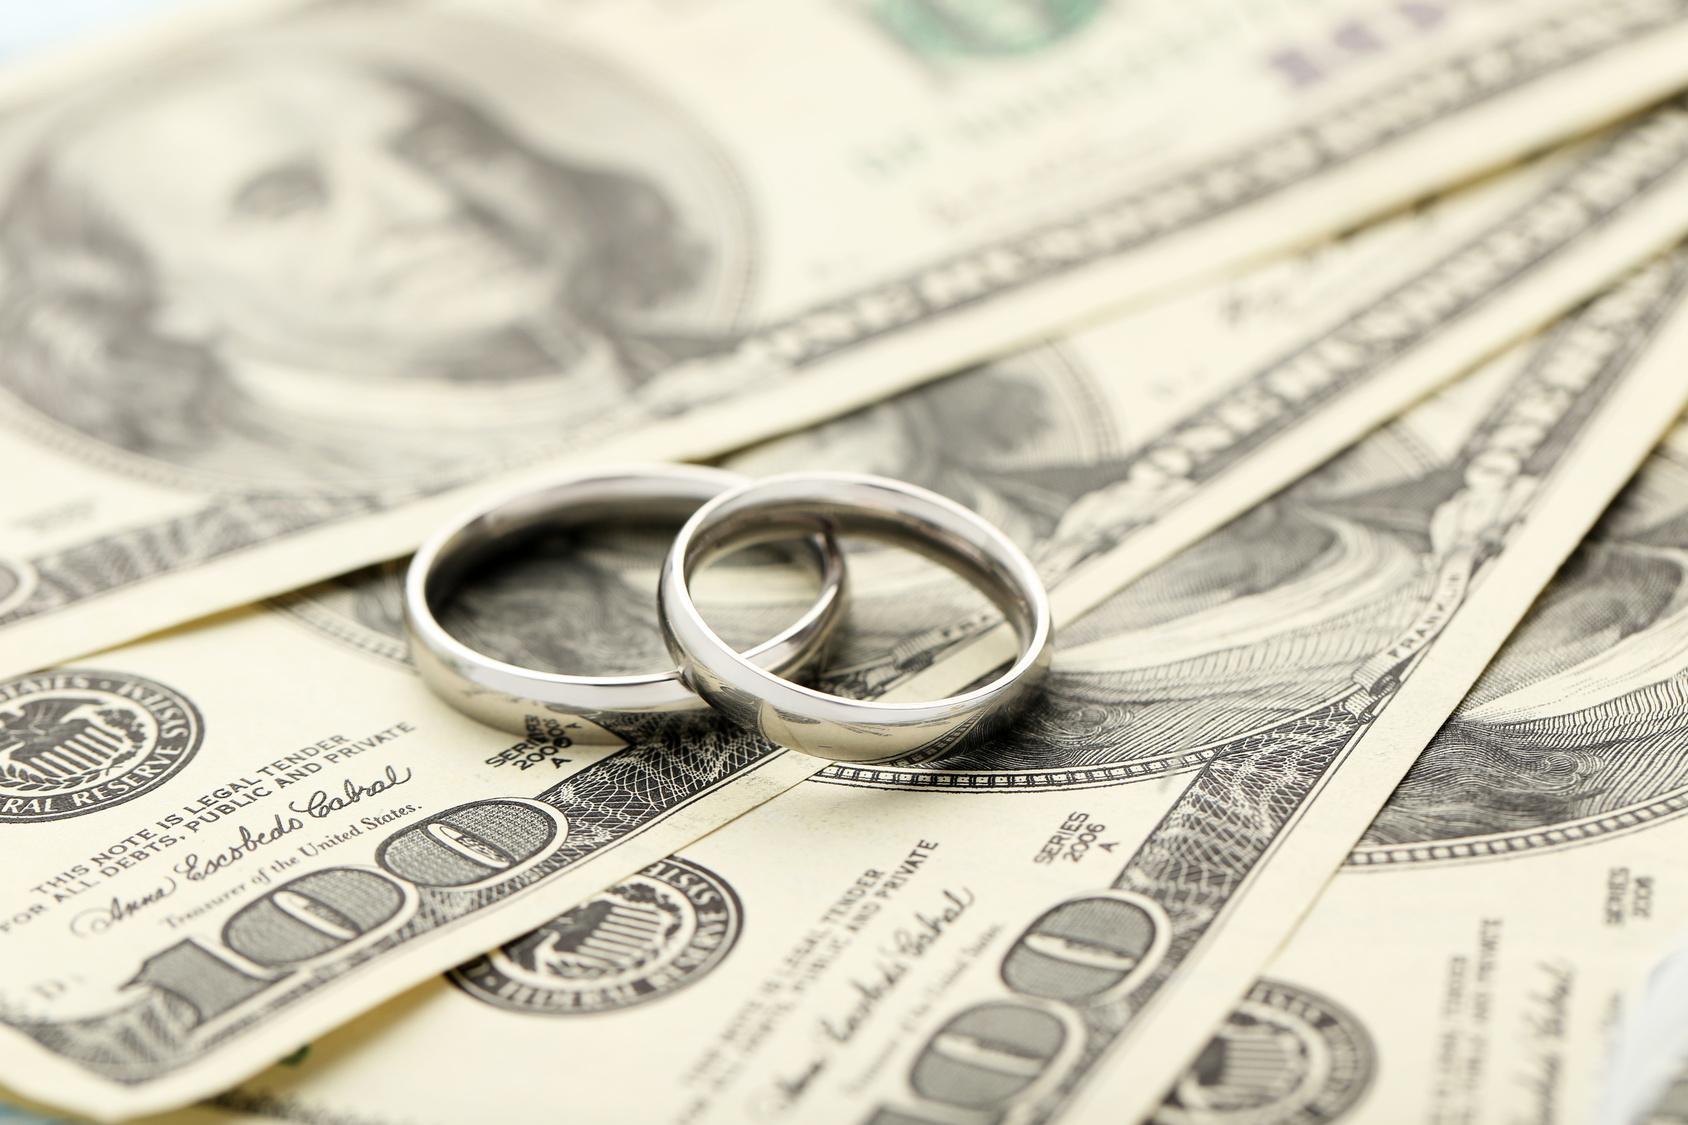 Silver Wedding Rings On One Hundred Dollars Bill